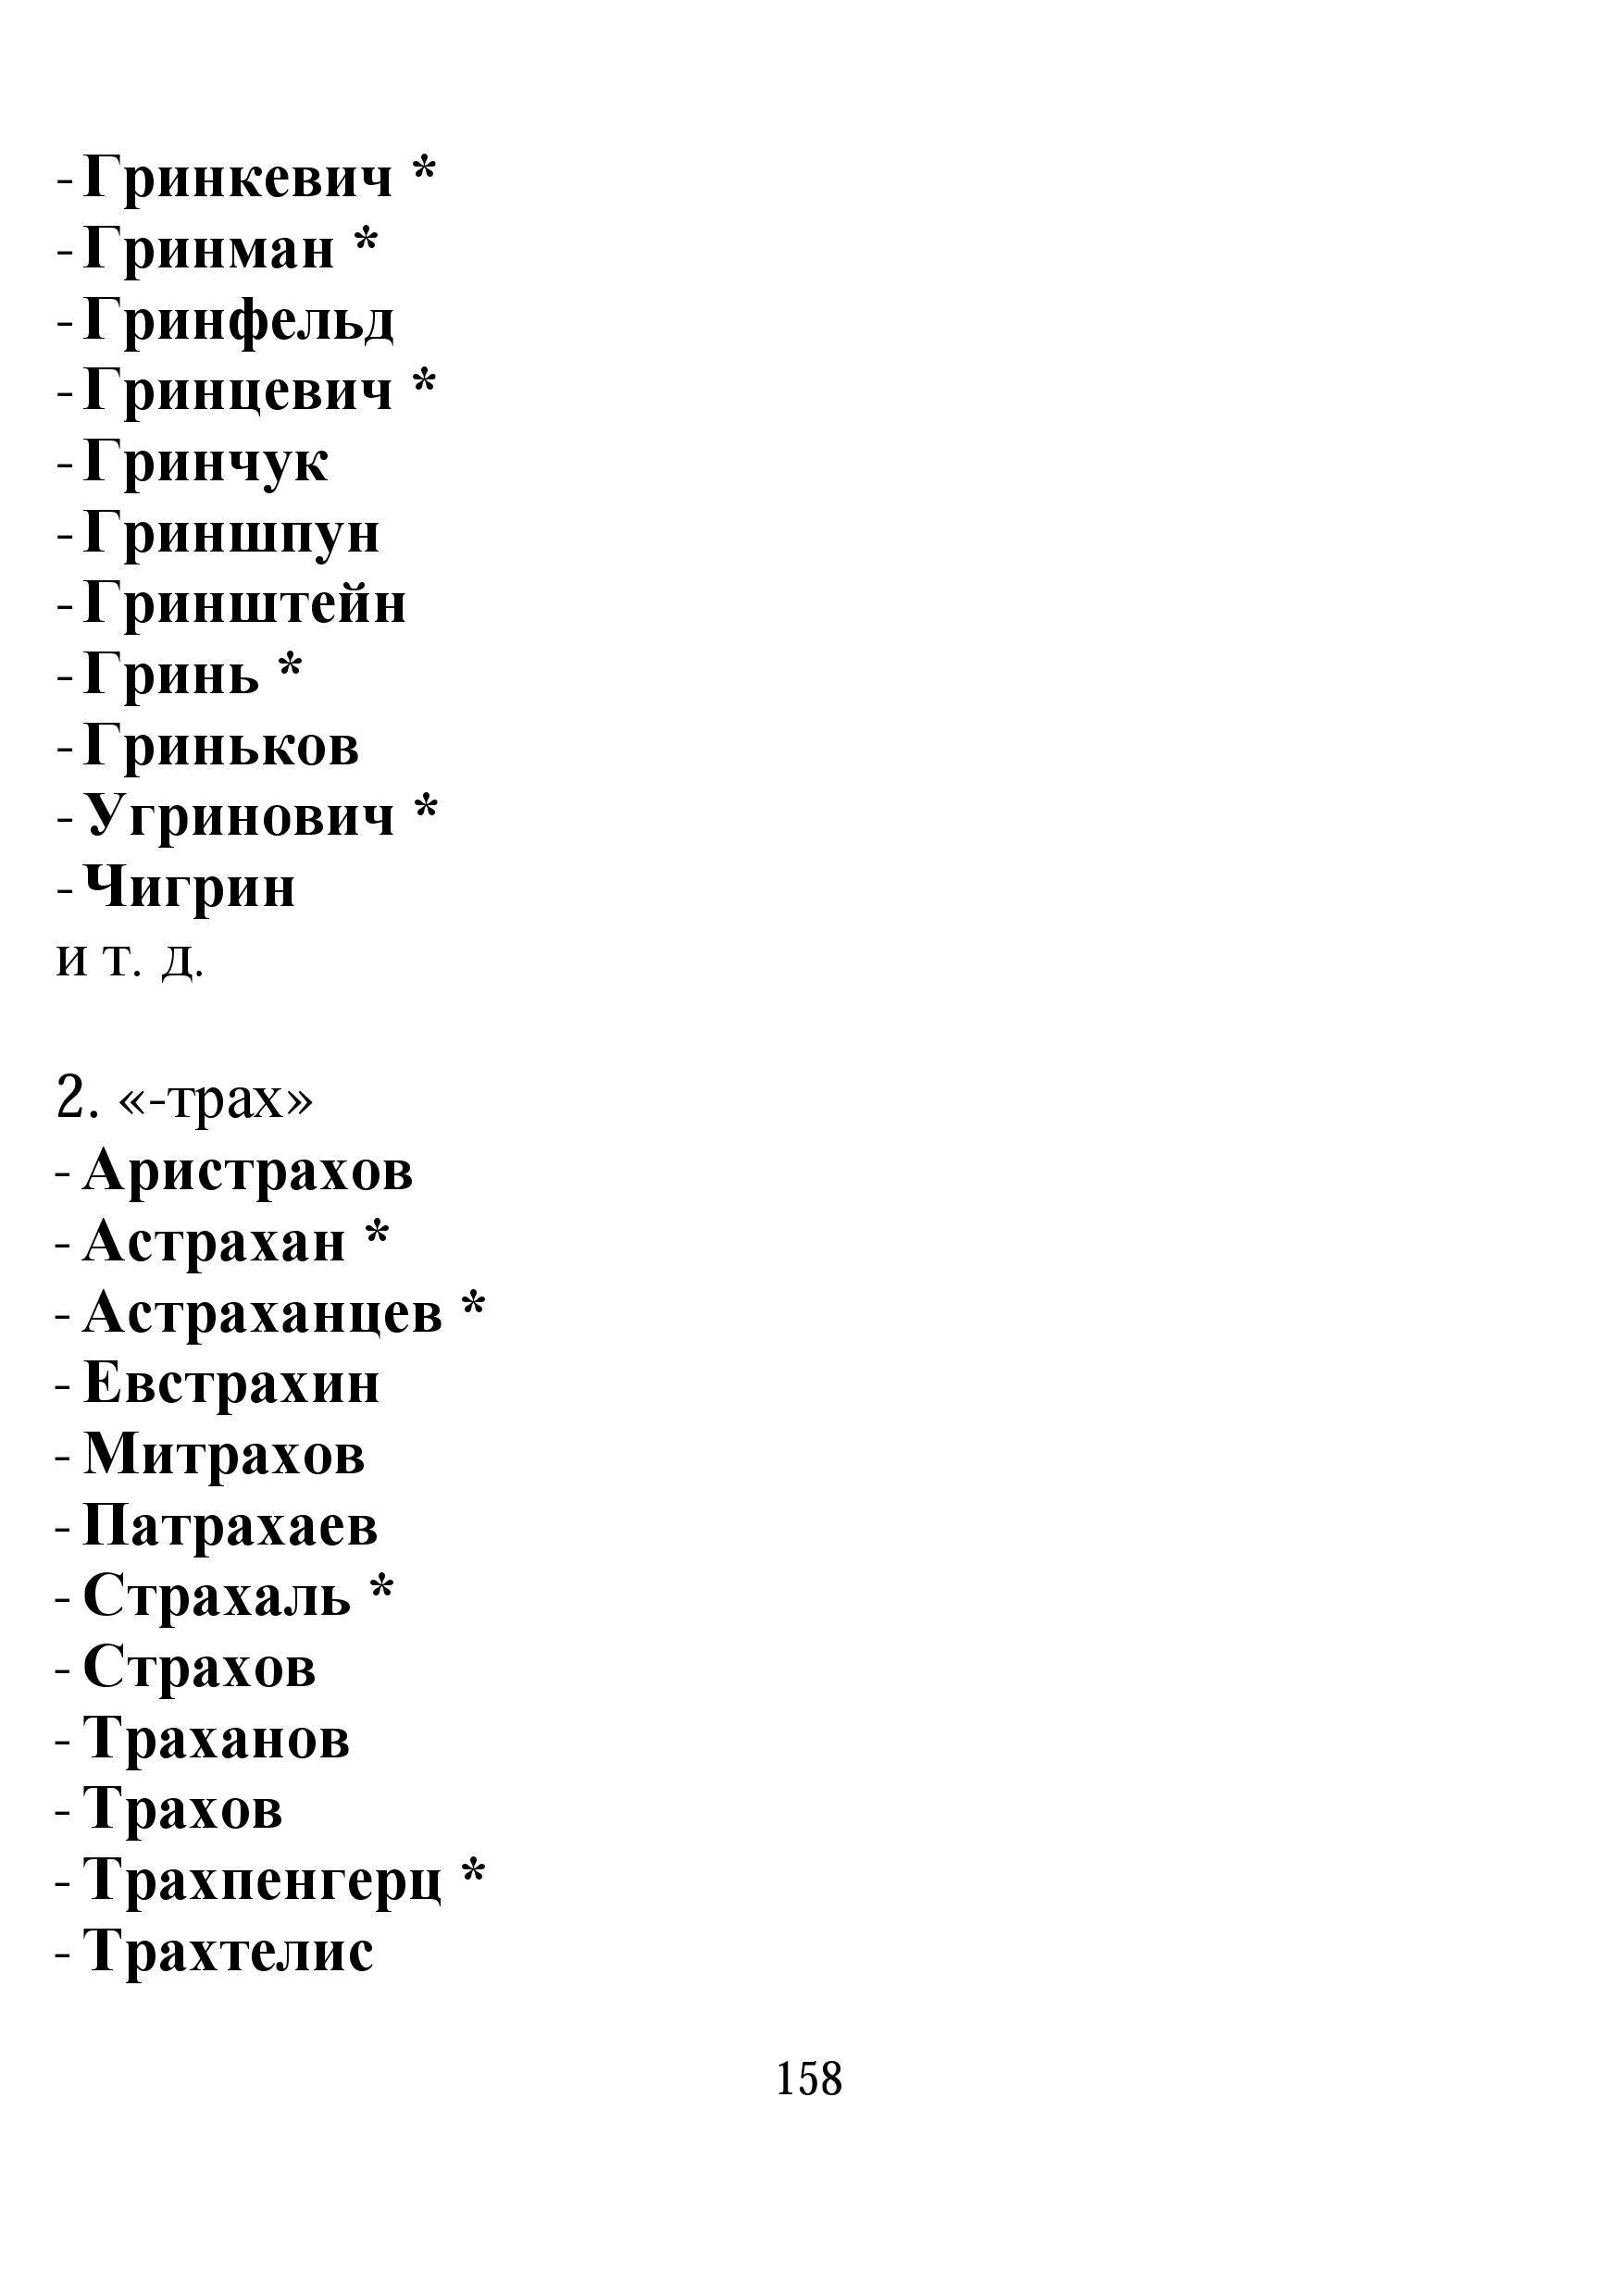 http://s2.uploads.ru/TFXZd.jpg